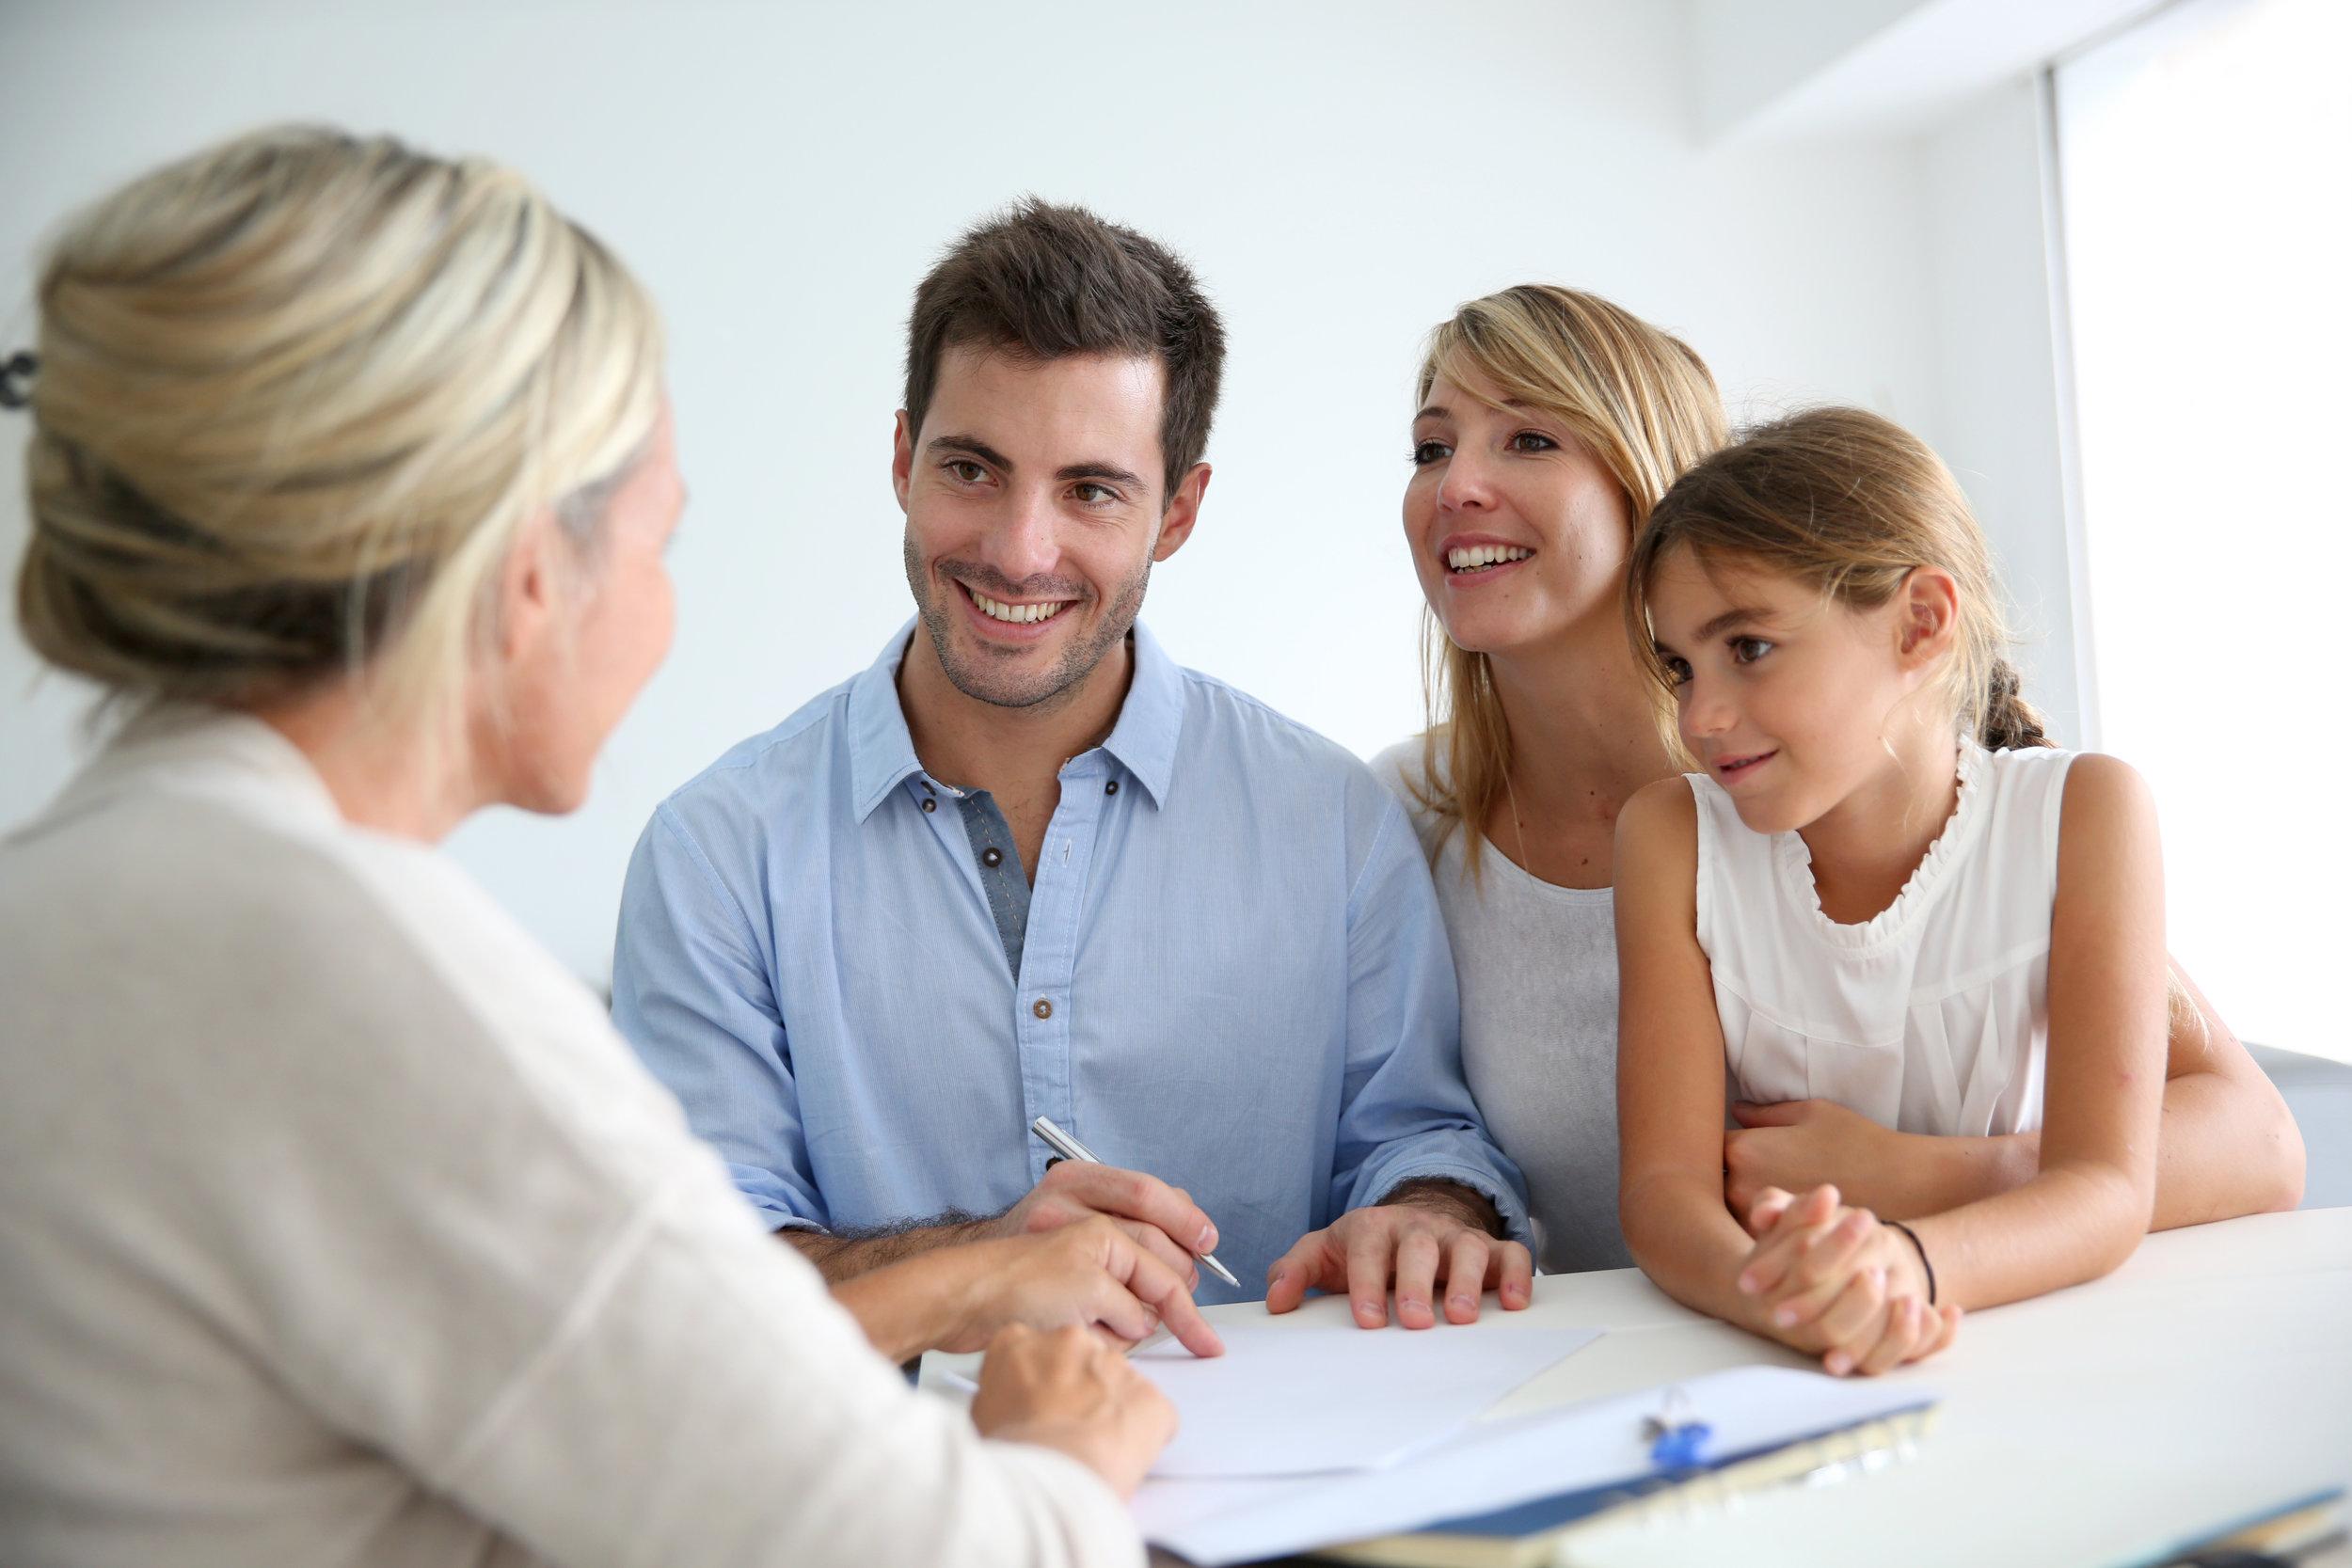 bigstock-Family-meeting-real-estate-age-55766201-1.jpg